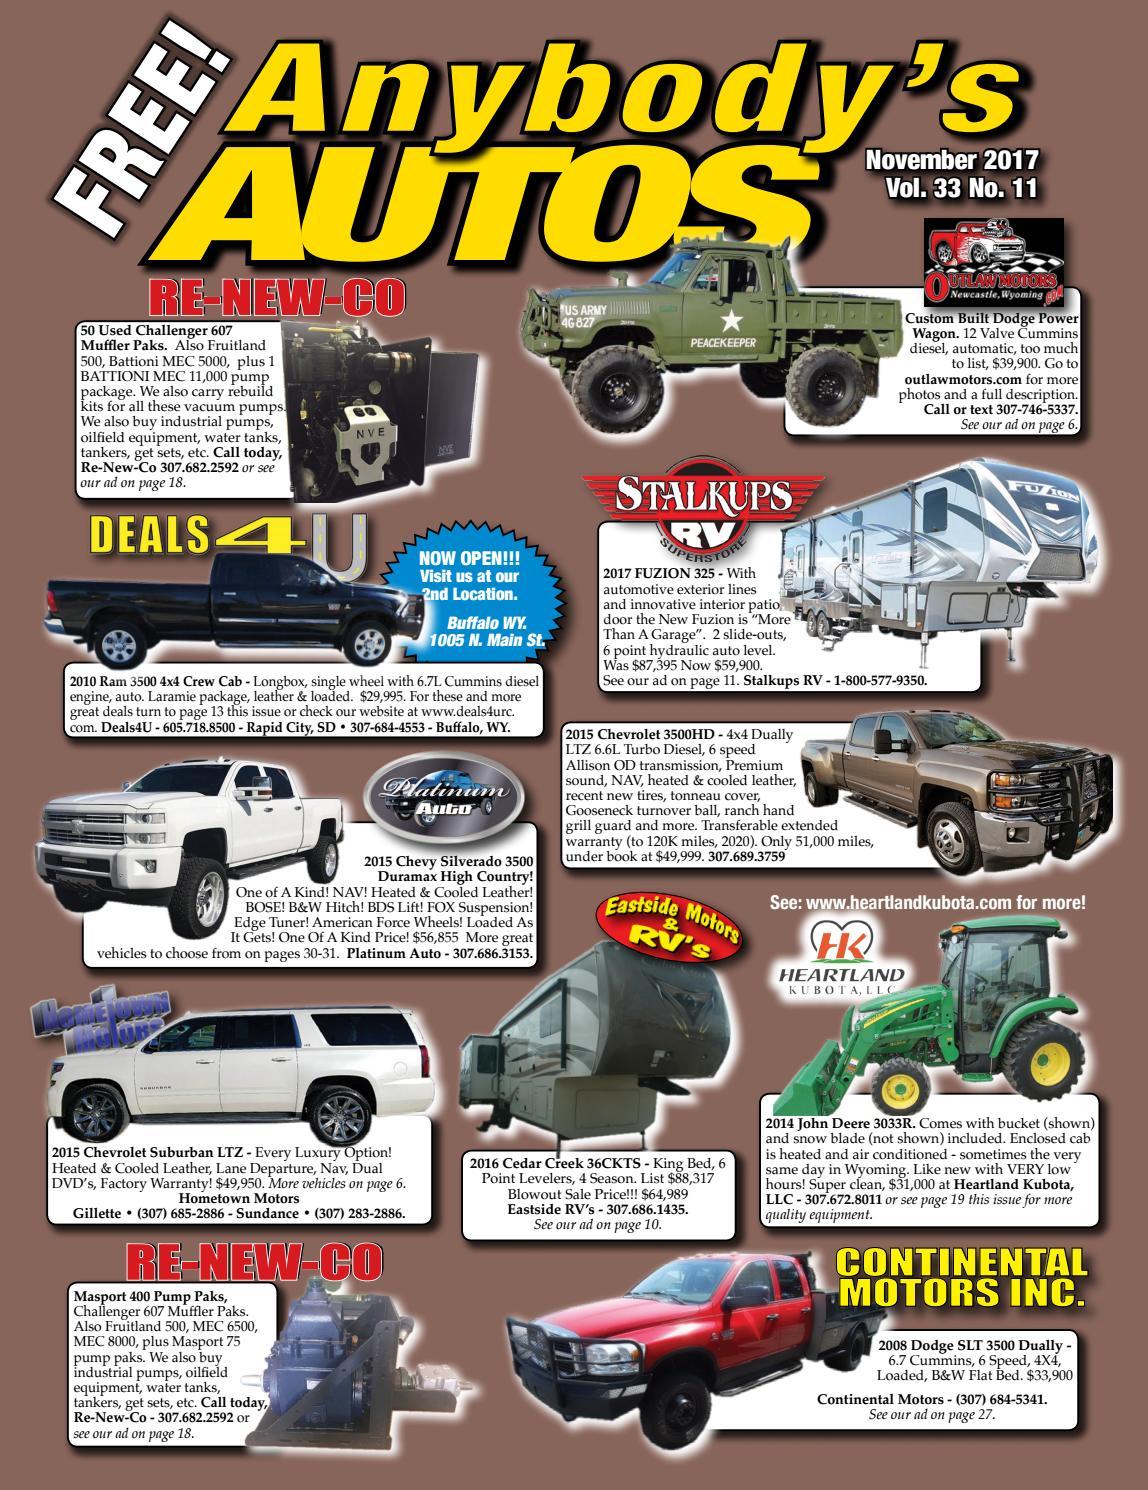 Used 6 Door Truck For Sale : truck, 1977-1987, Chevy, Pickup, Truck, Steering, Shaft, Coupler